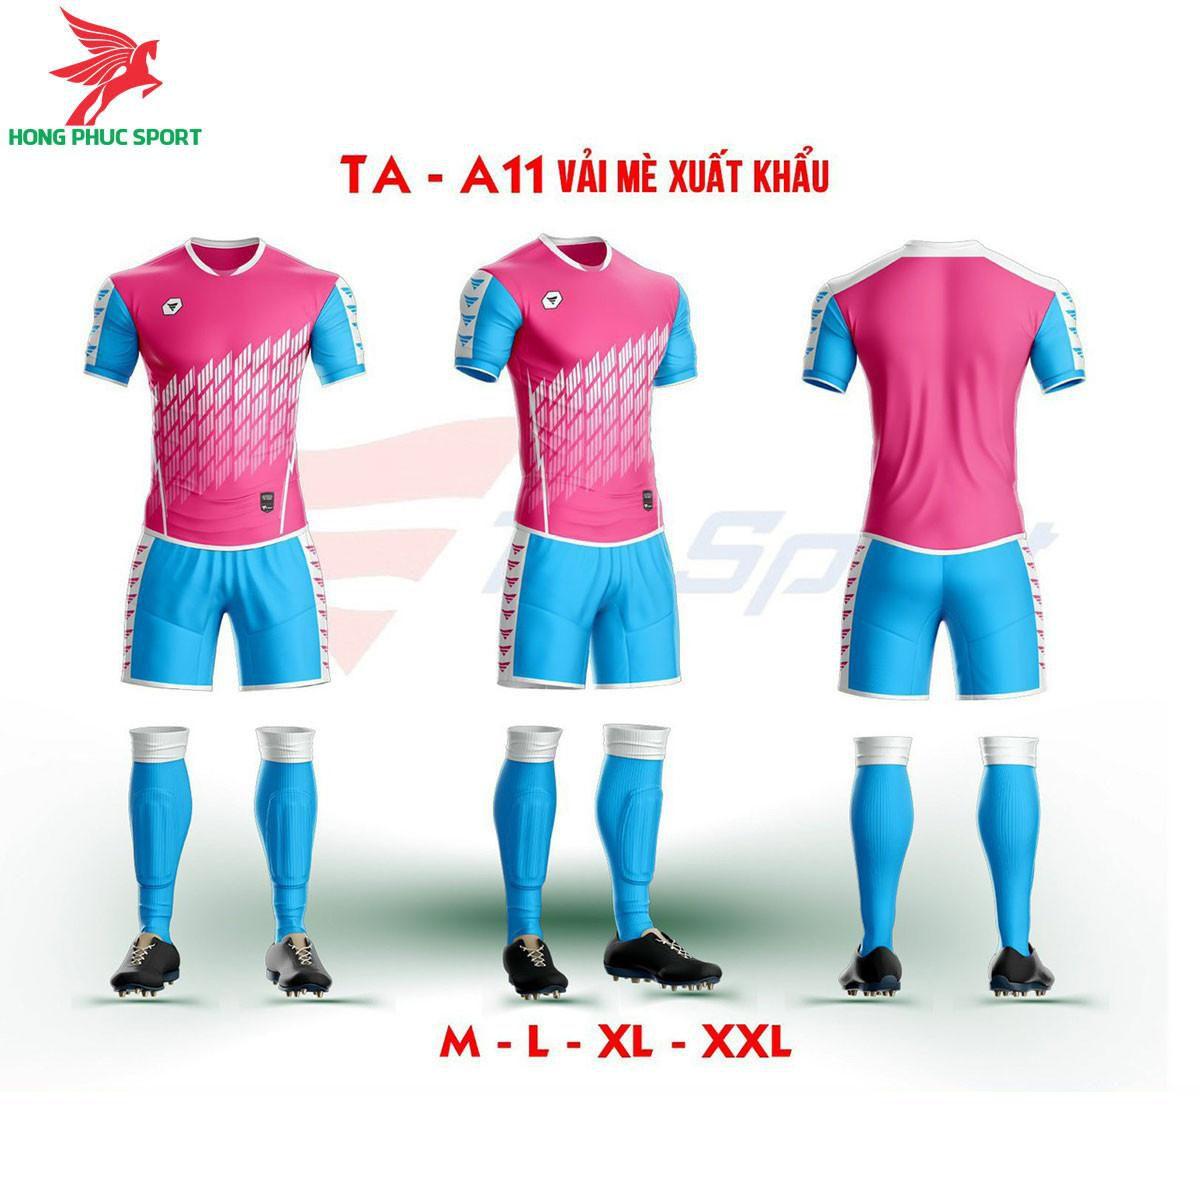 https://cdn.hongphucsport.com/unsafe/s4.shopbay.vn/files/285/ao-khong-logo-truong-an-ta-a11-mau-hong-60474230c7e27.jpg